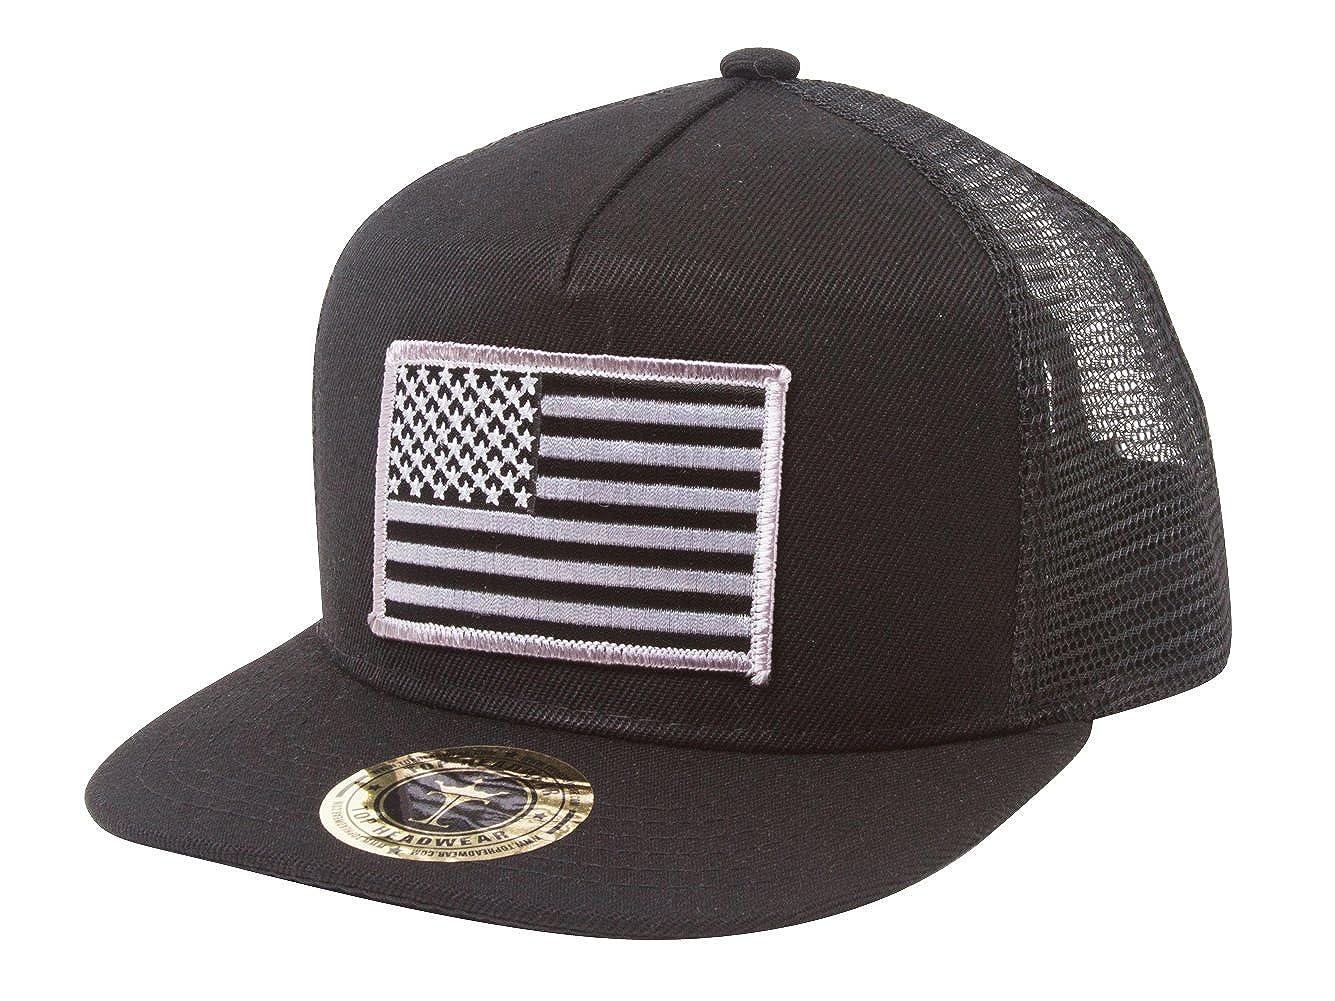 Amazon.com  TOP HEADWEAR USA Flag Flat Bill Trucker Mesh Snapback Hat -  Black  Clothing 63348868b54